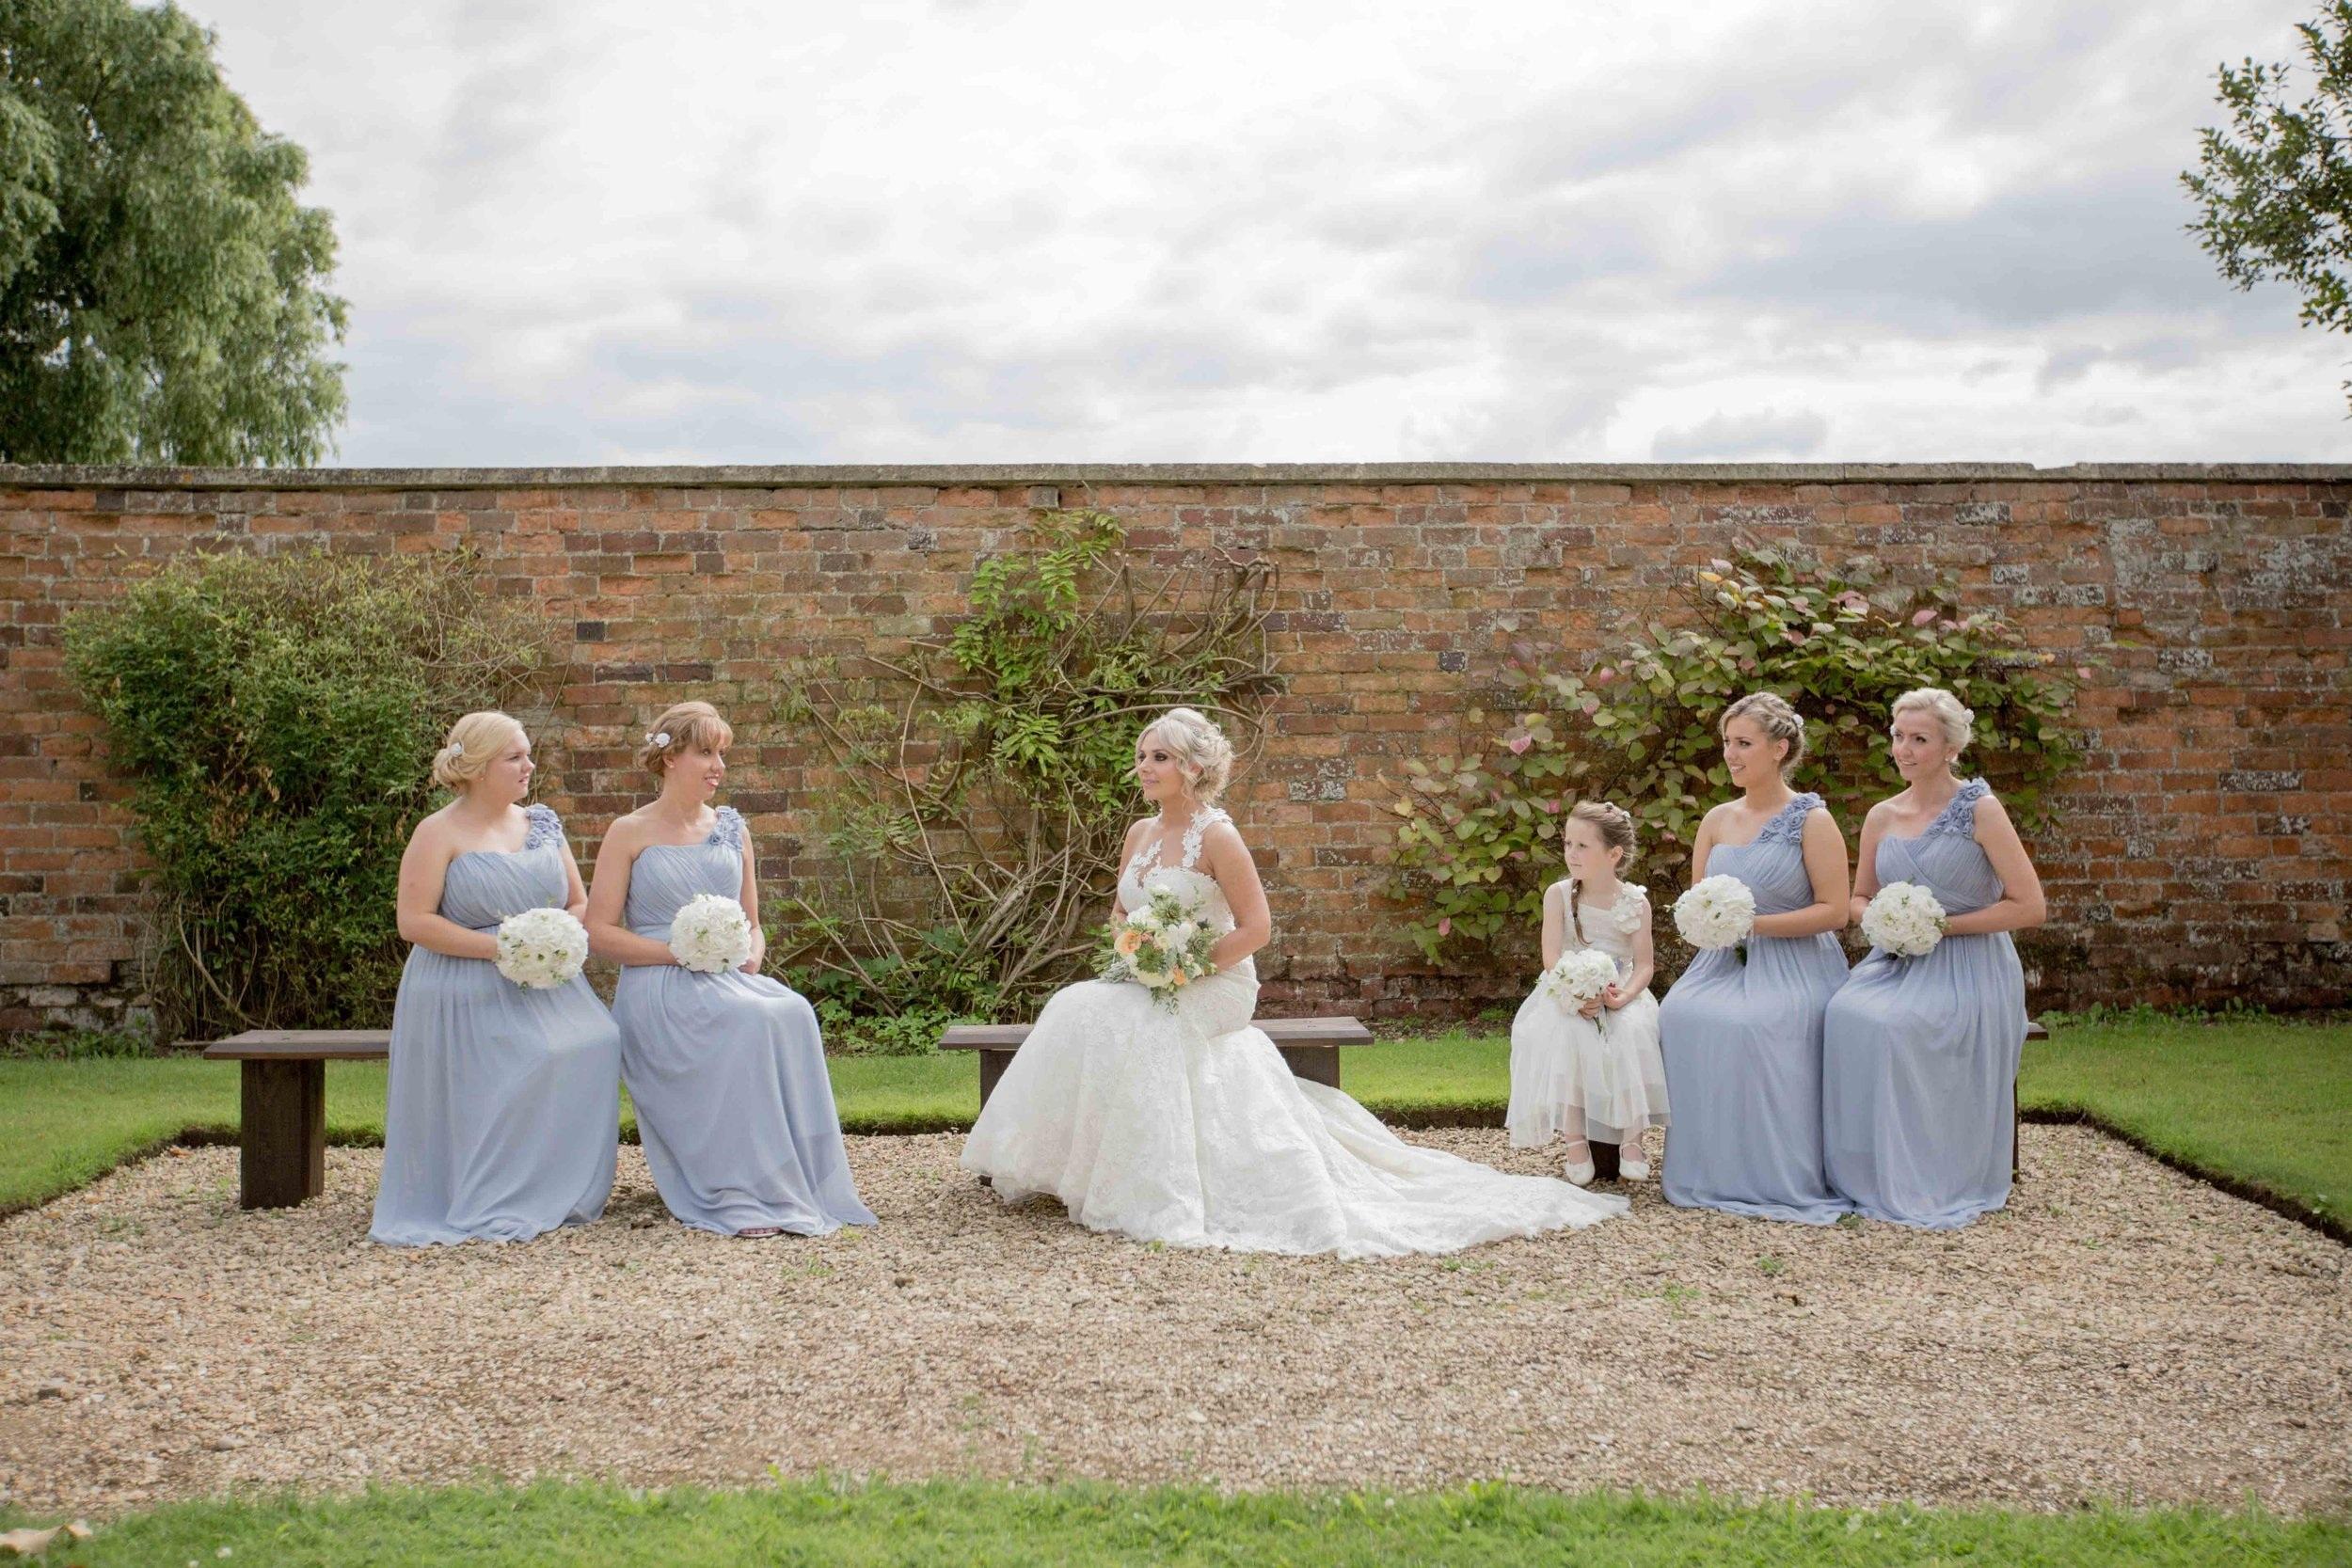 cotswold-wedding-photography-at-stonehouse-court-hotel-natalia-smith-photography-gloucestershire-wedding-photographer-57.jpg